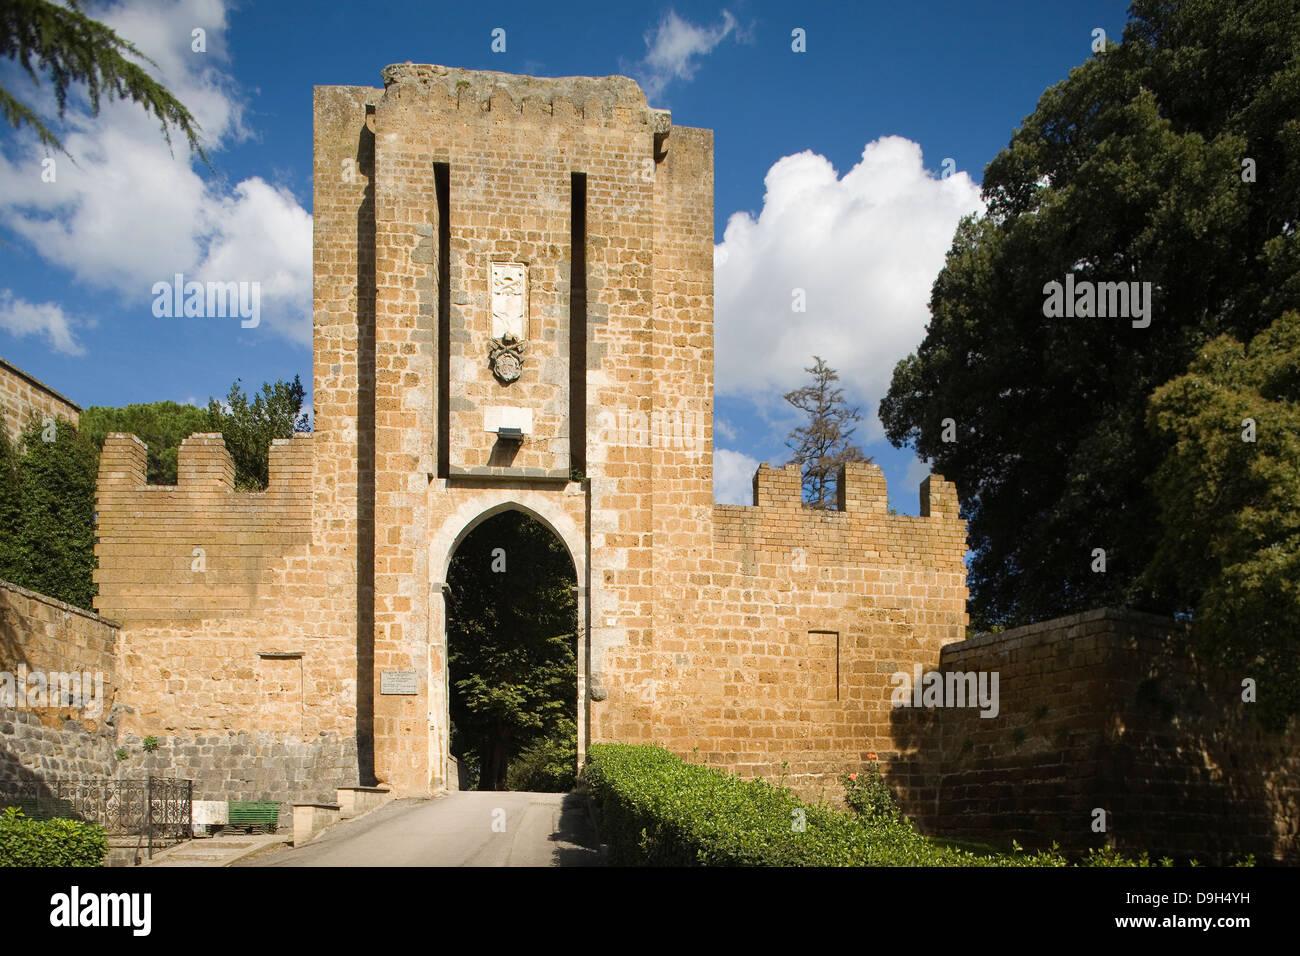 europe, italy, umbria, orvieto, albornoz fortress and rocca gate Stock Photo